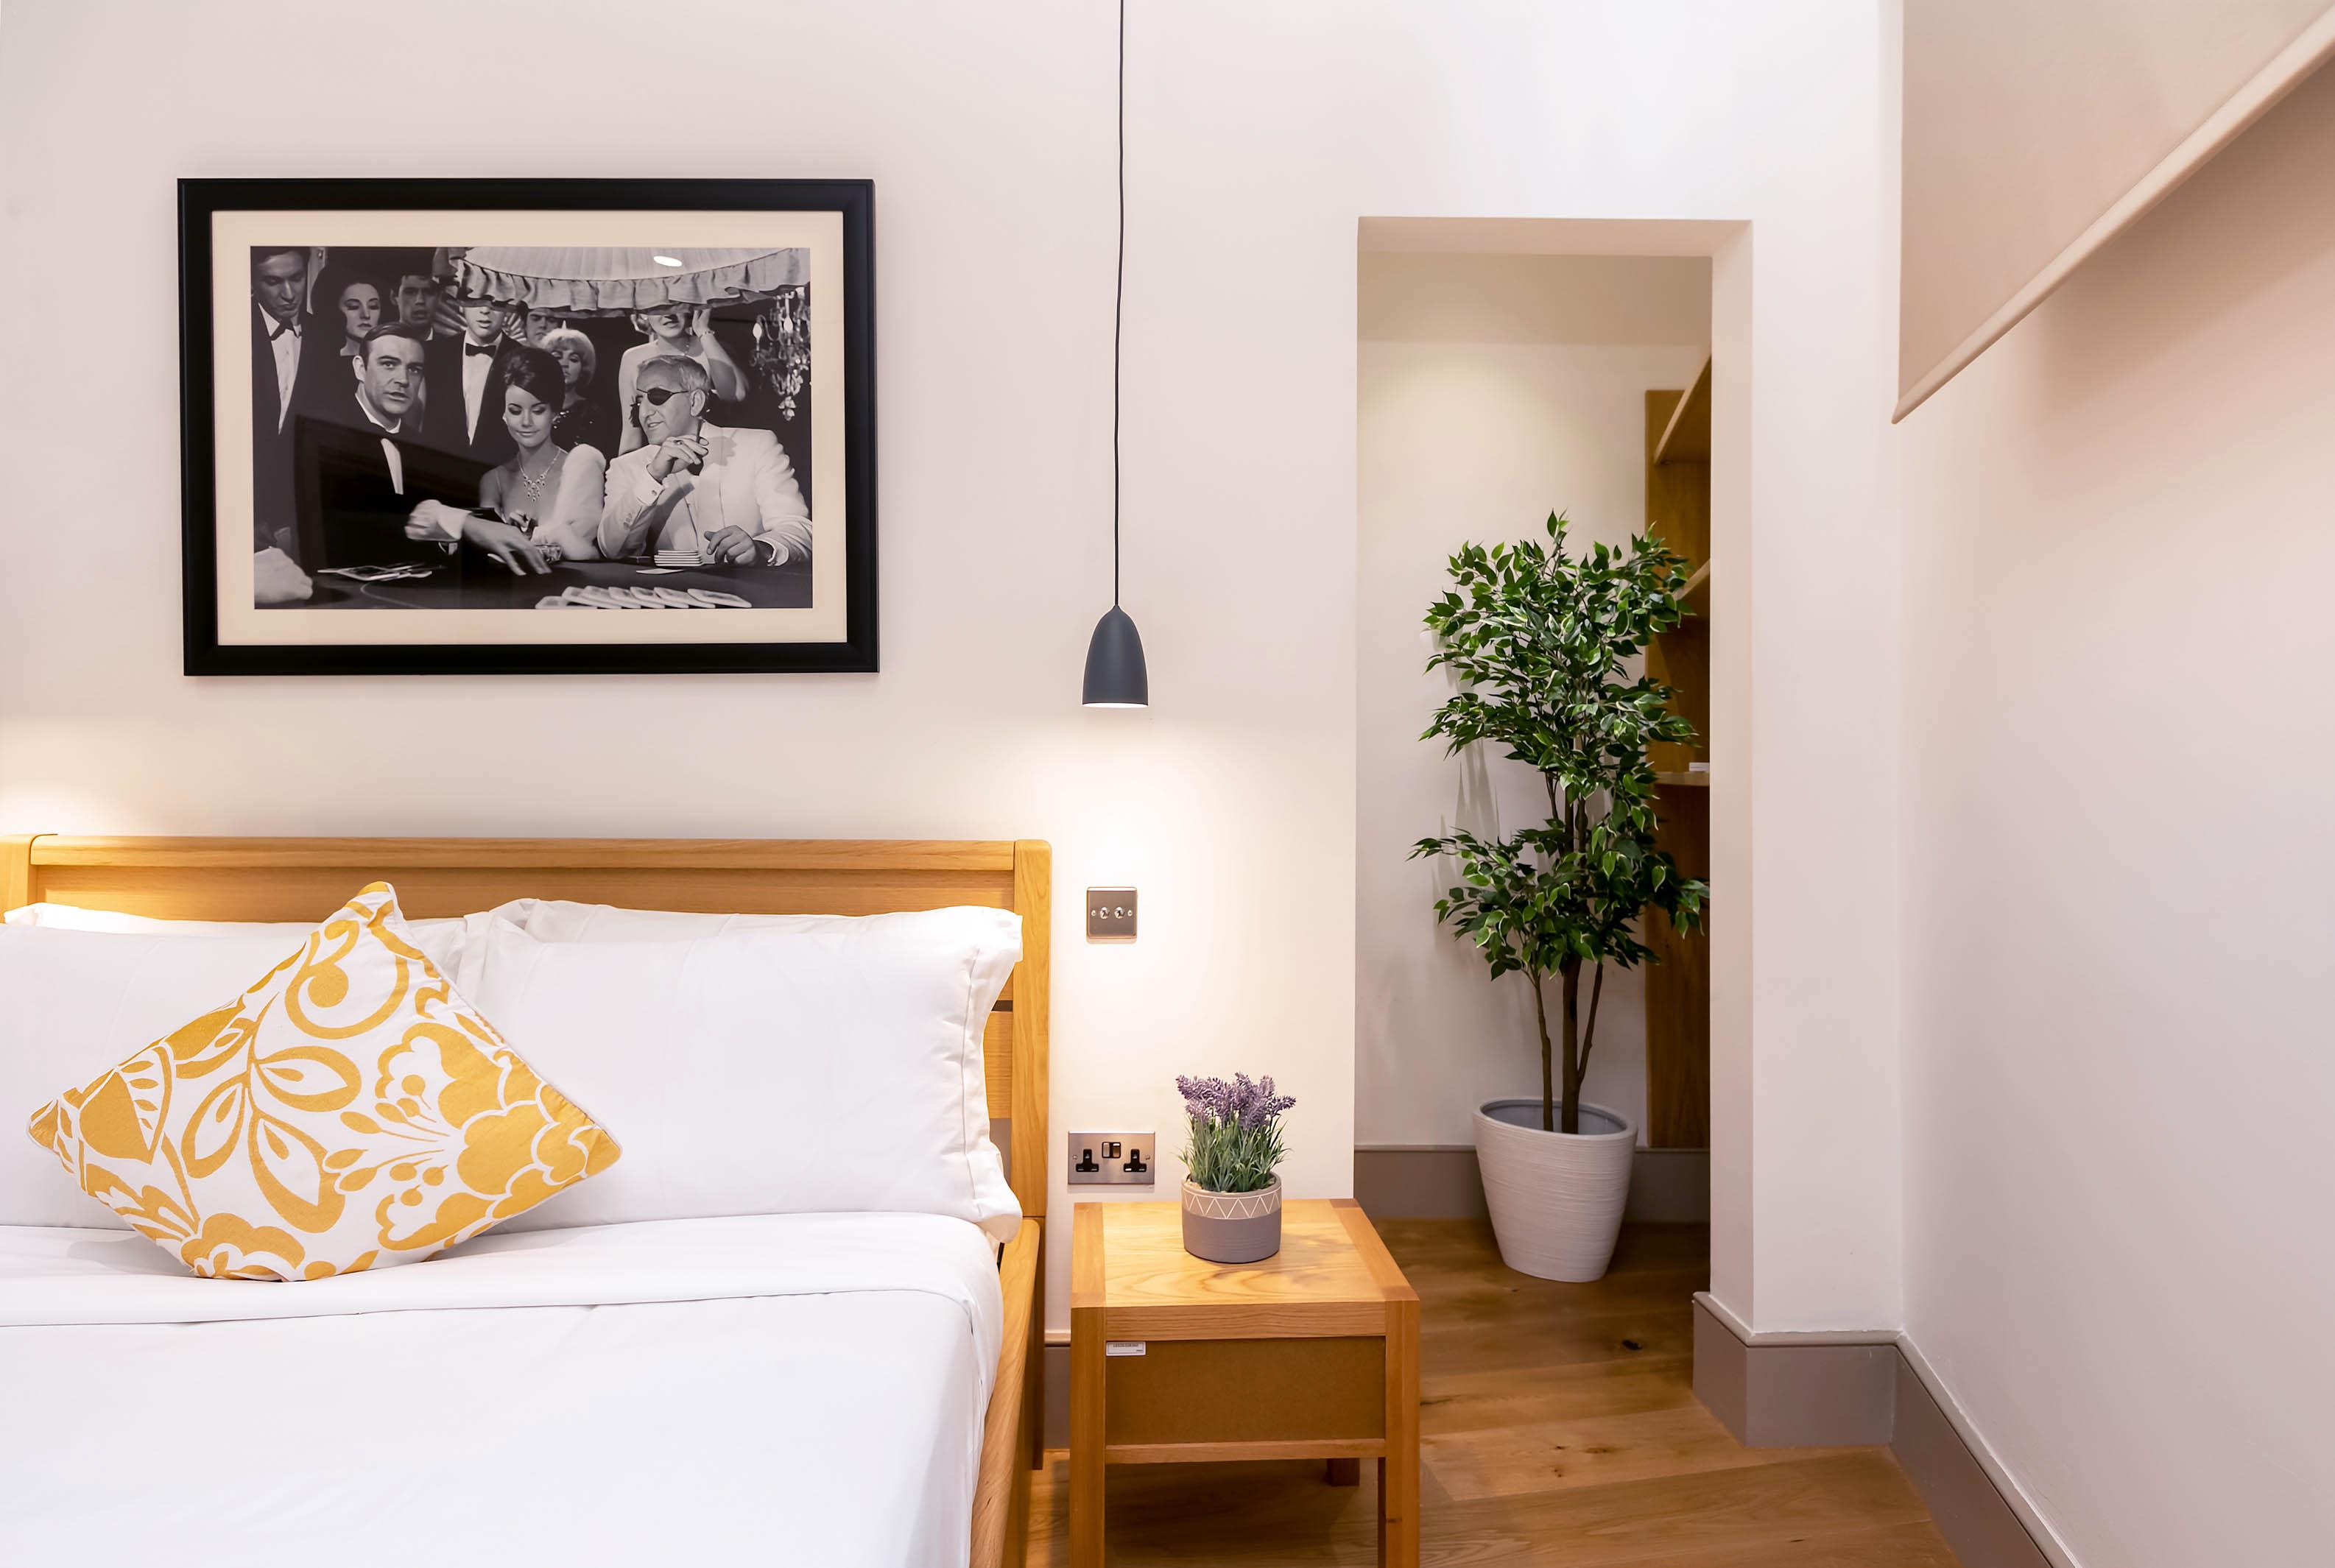 Lovelydays luxury service apartment rental - London - Fitzrovia - Wells Mews B - Lovelysuite - 2 bedrooms - 2 bathrooms - Double bed - 7bb8dfc4fd72 - Lovelydays